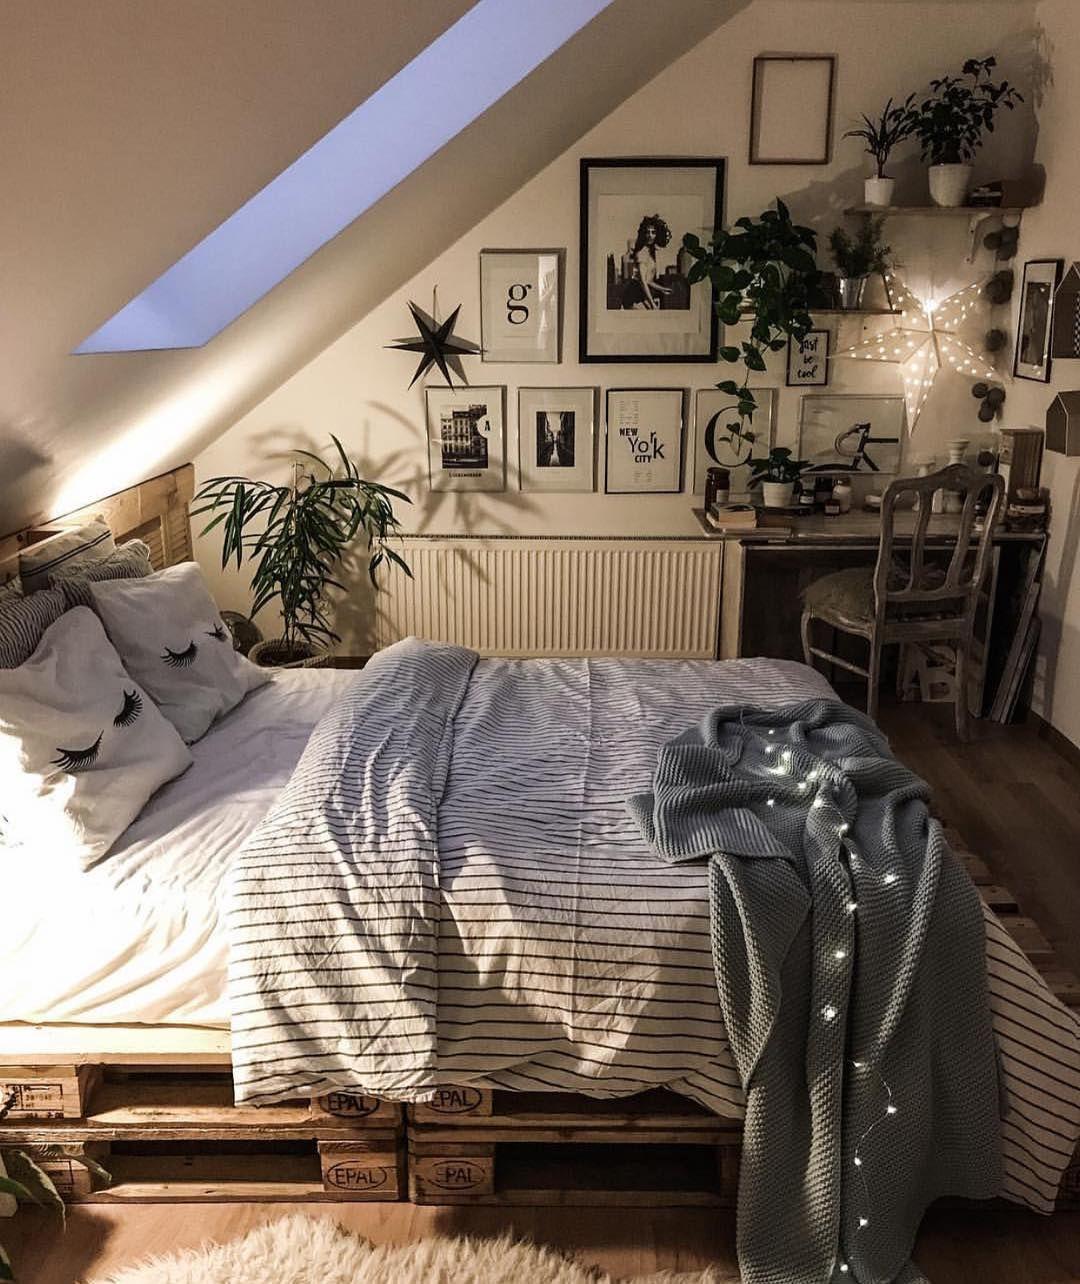 Housedecor interiordesign bedroom dreamhouse dreambedroom plants indoors house also best nice and snug images in ideas decor rh pinterest